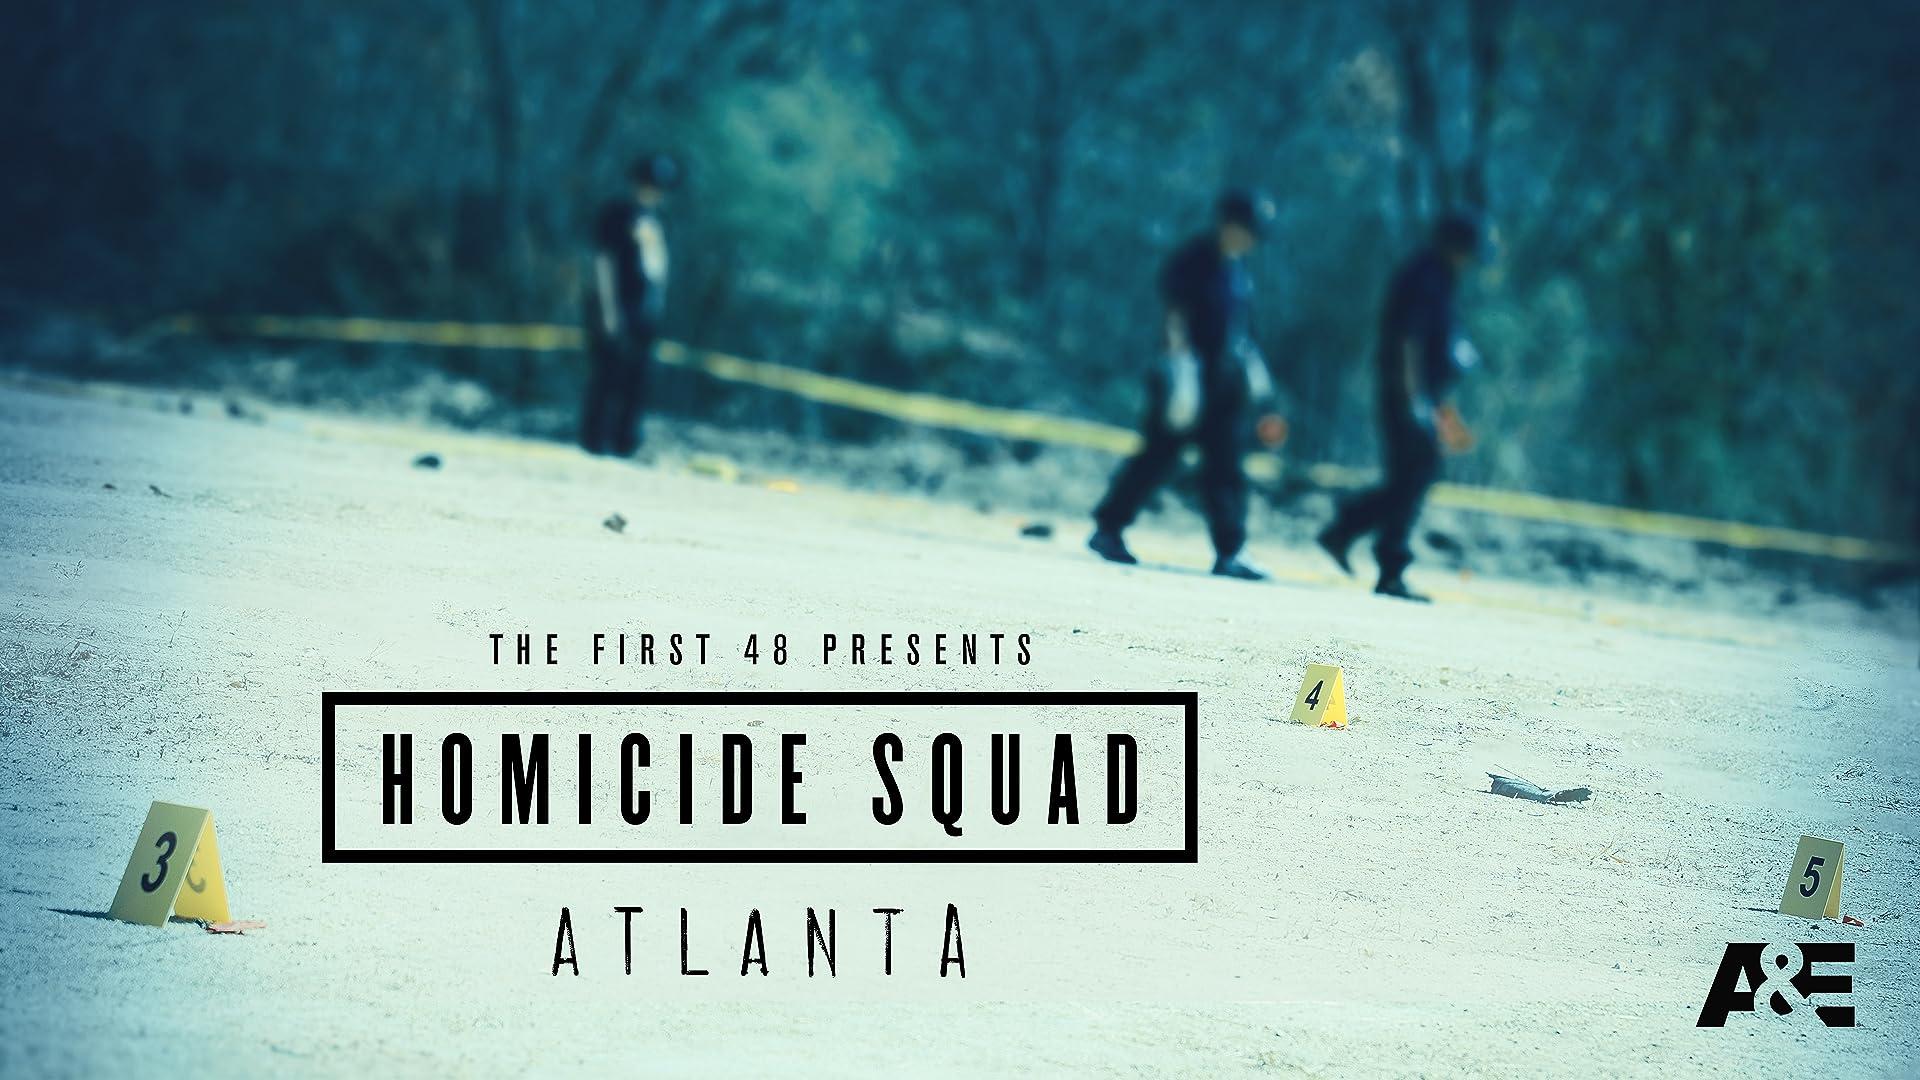 The First 48 Presents: Homicide Squad Atlanta